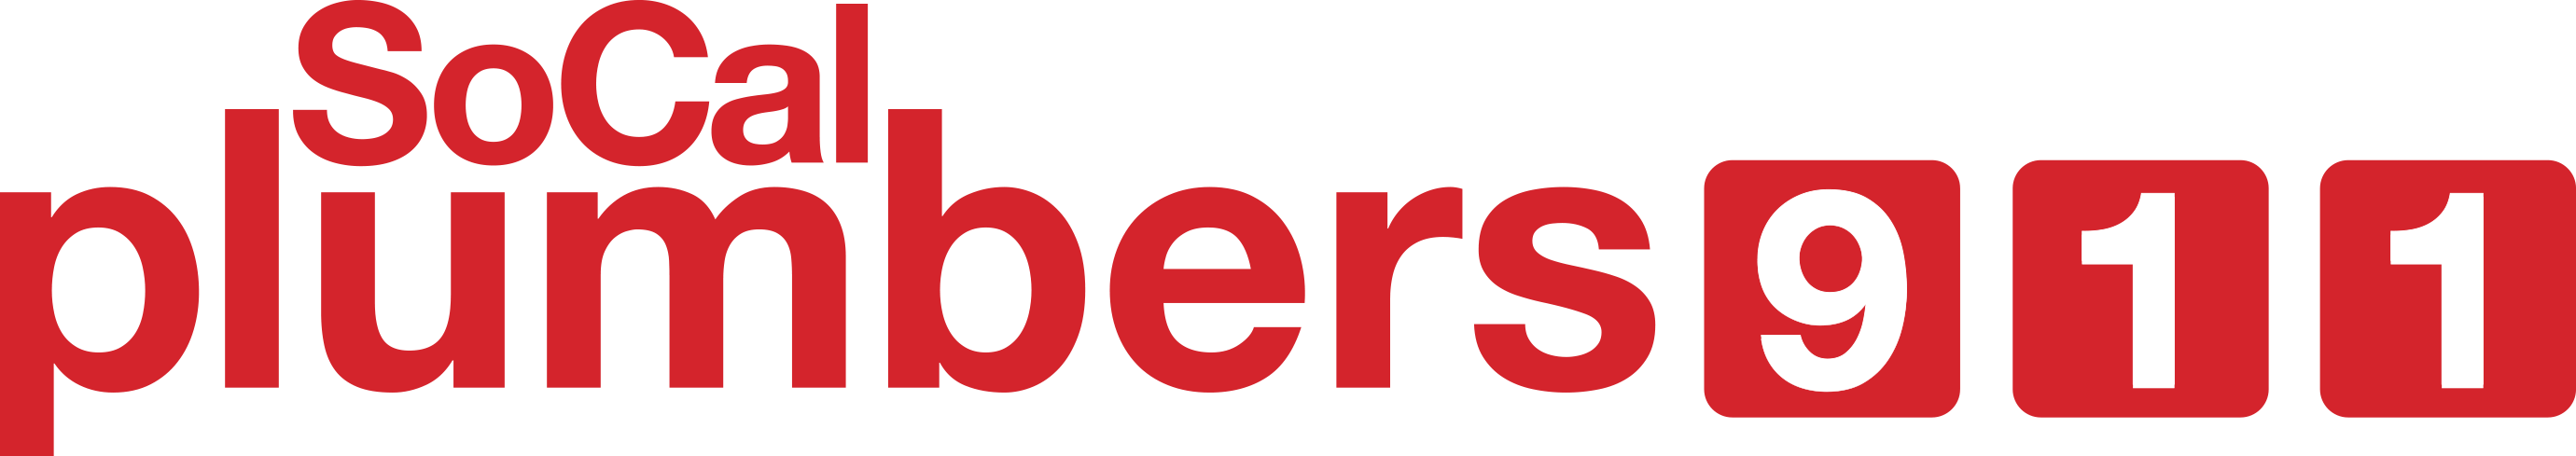 SocalPlumbers